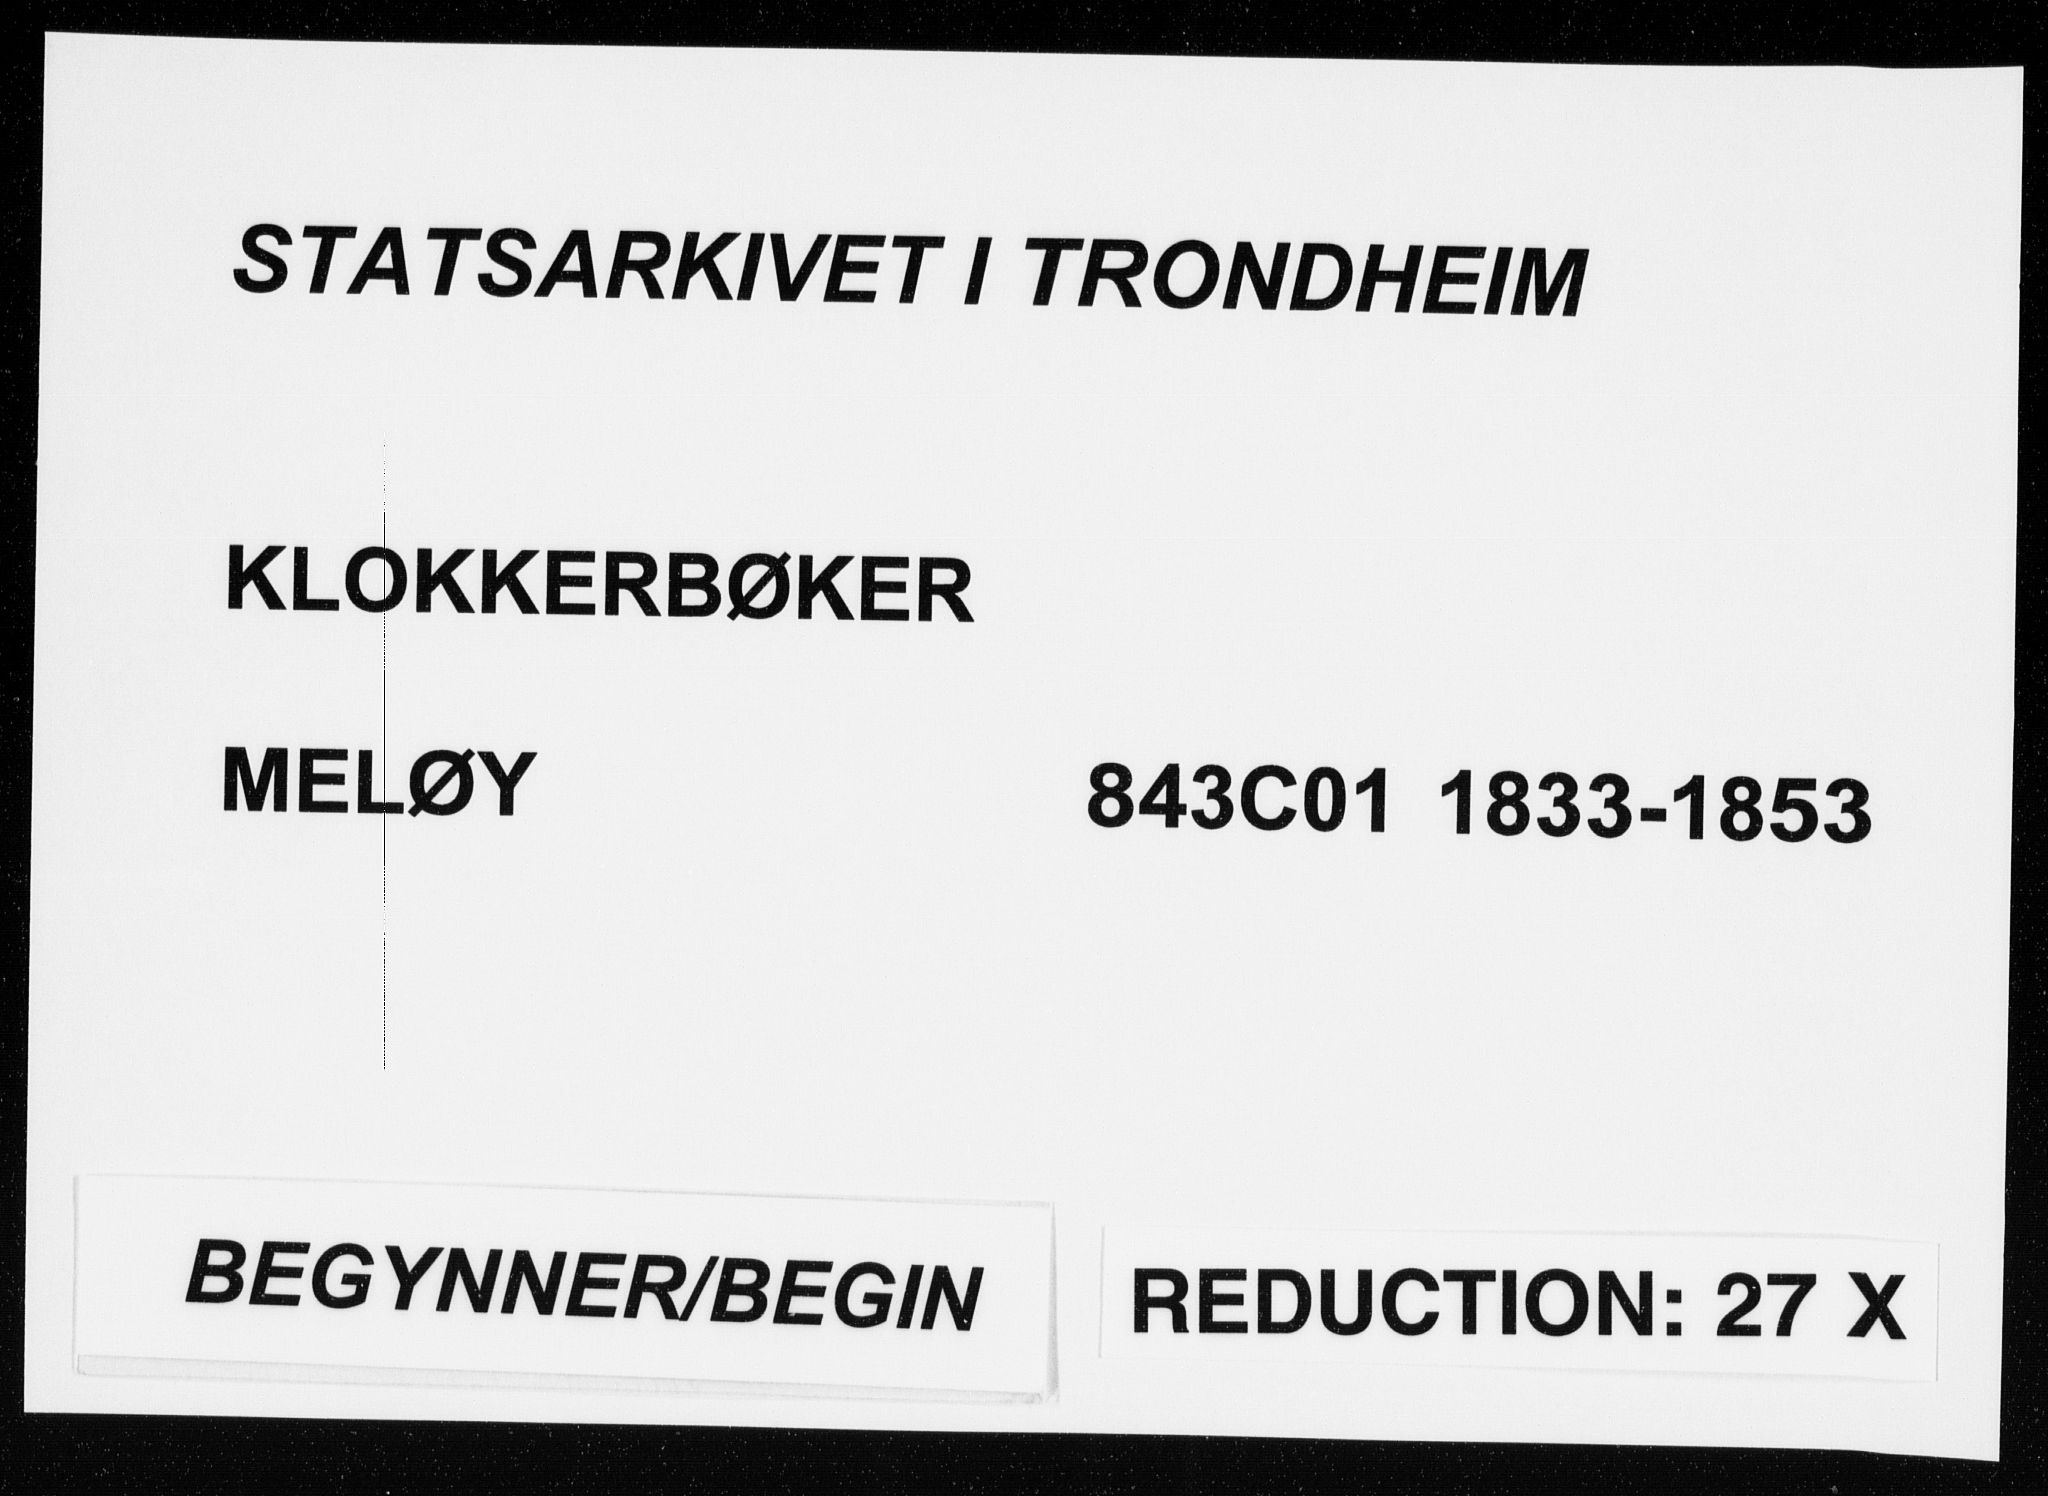 SAT, Ministerialprotokoller, klokkerbøker og fødselsregistre - Nordland, 843/L0632: Klokkerbok nr. 843C01, 1833-1853